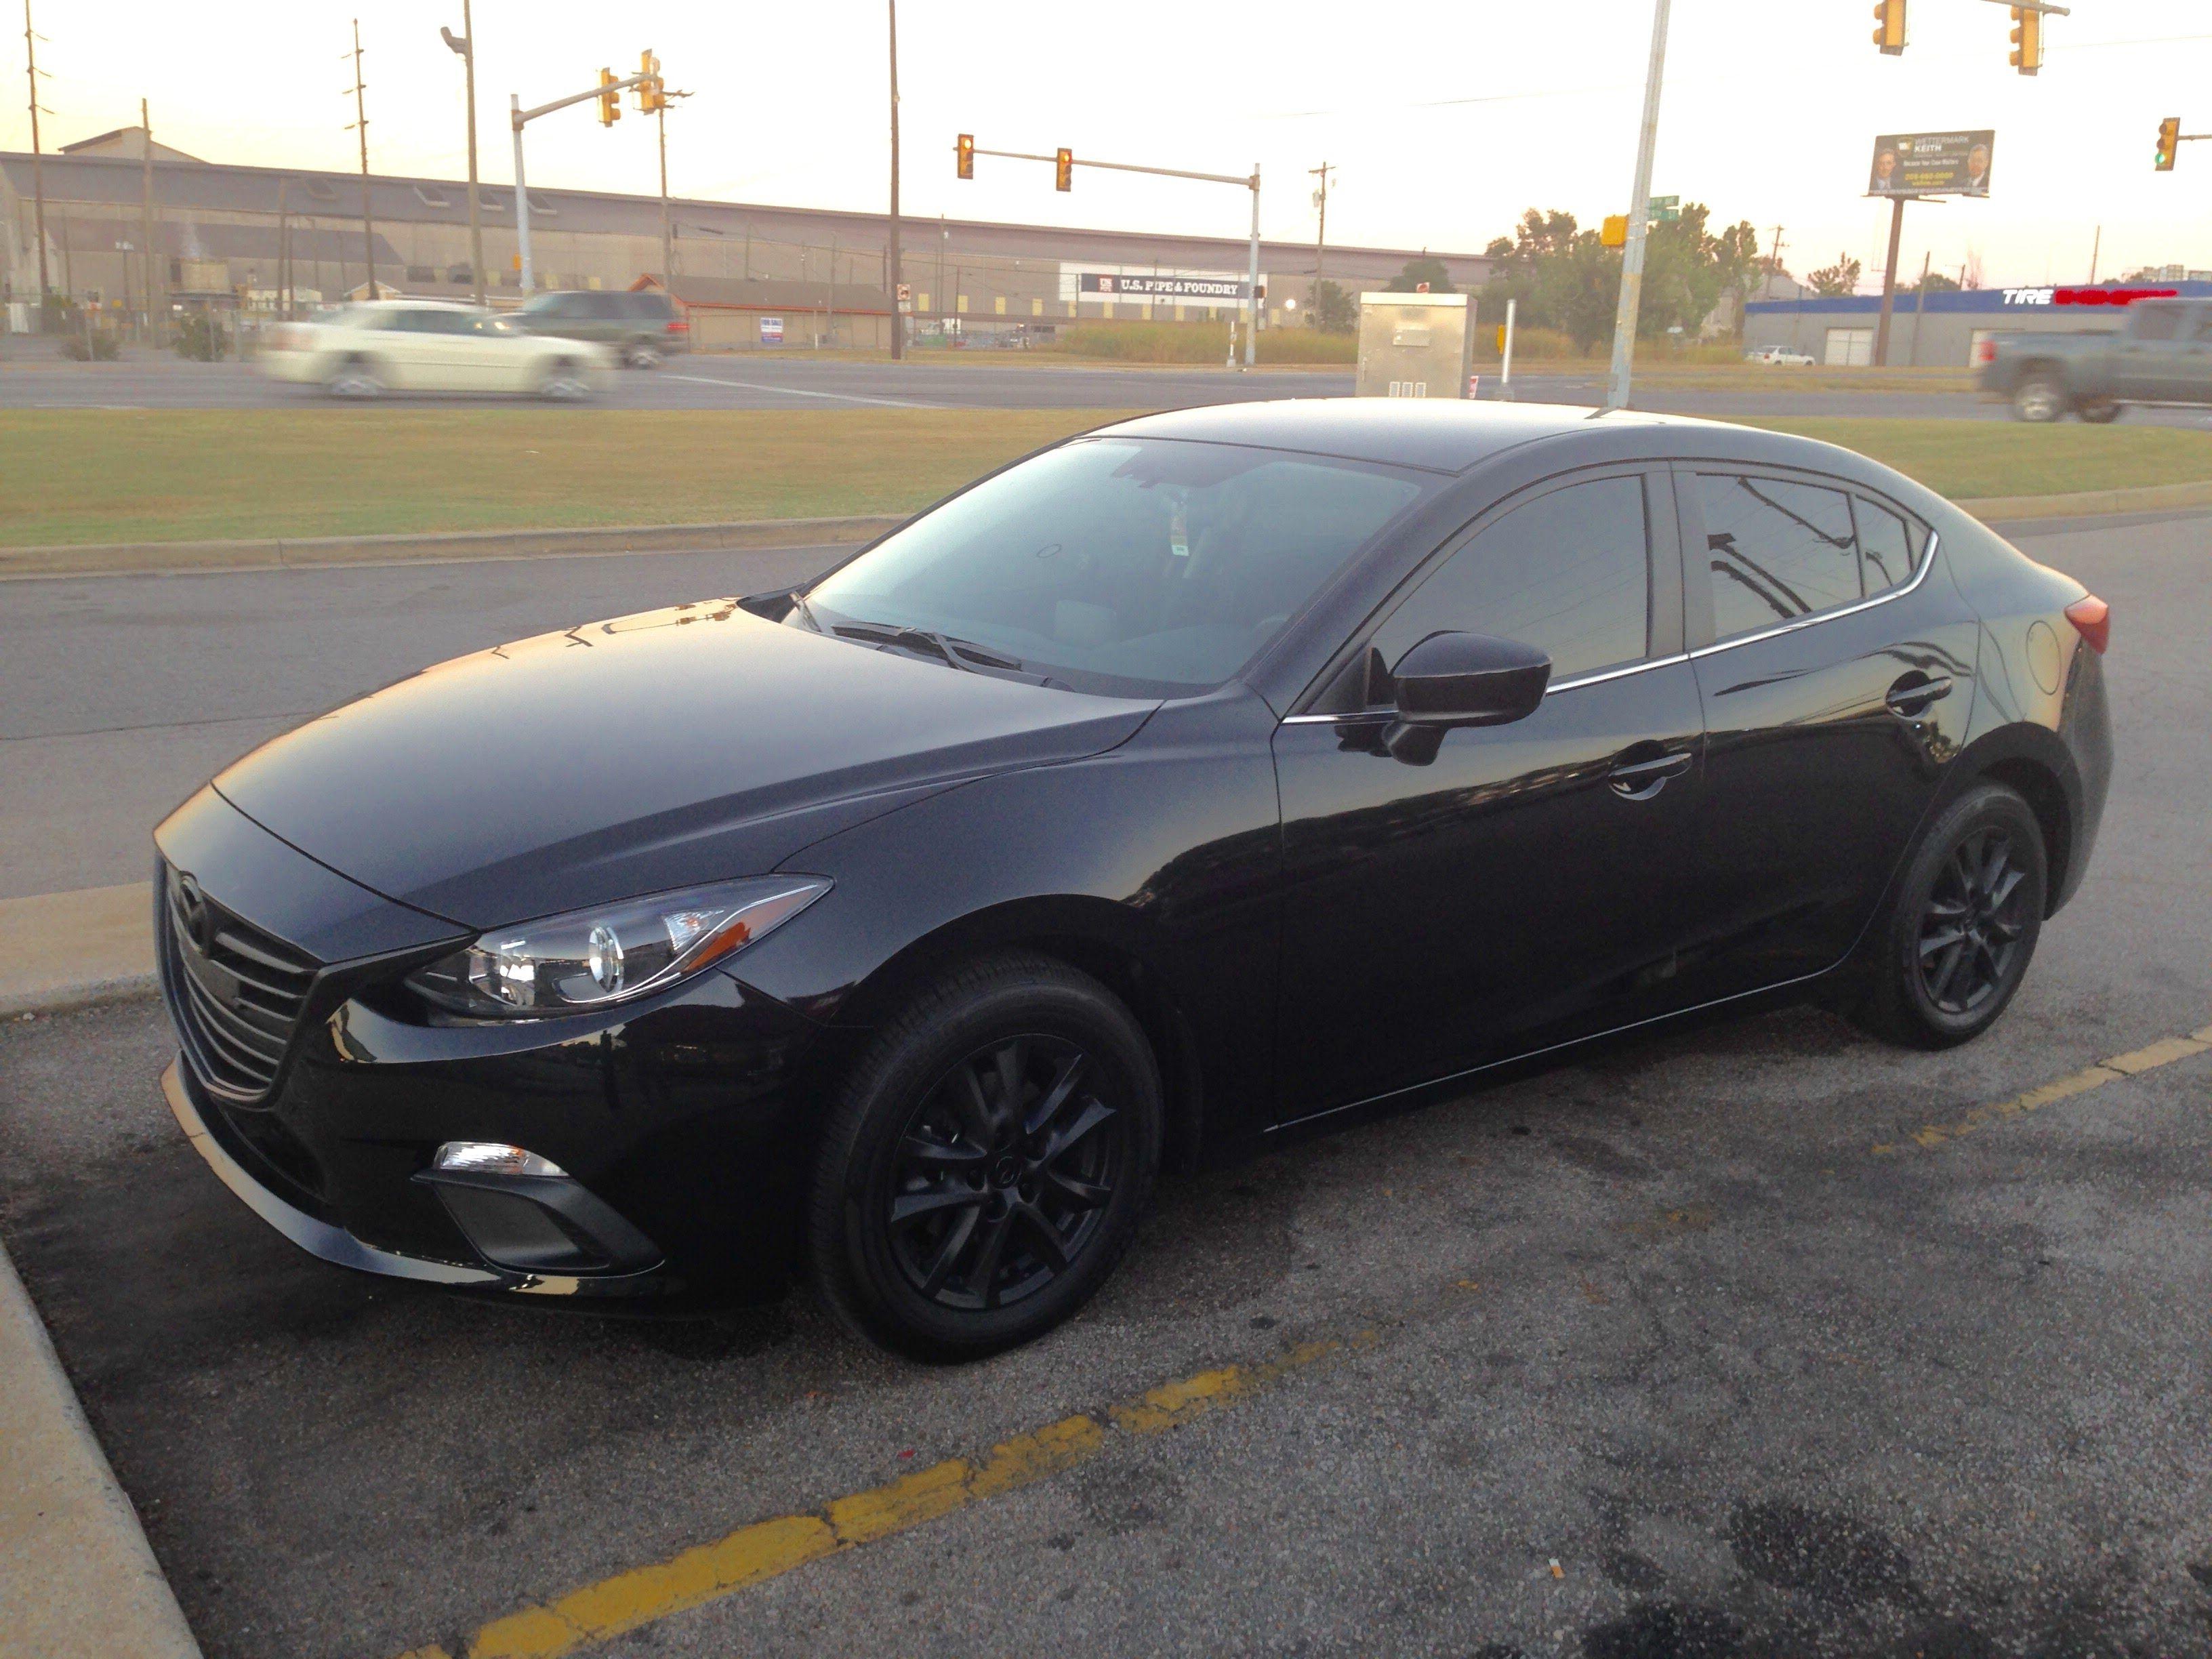 25+ best ideas about Mazda 3 on Pinterest | Mazda 3 black, Mazda ...